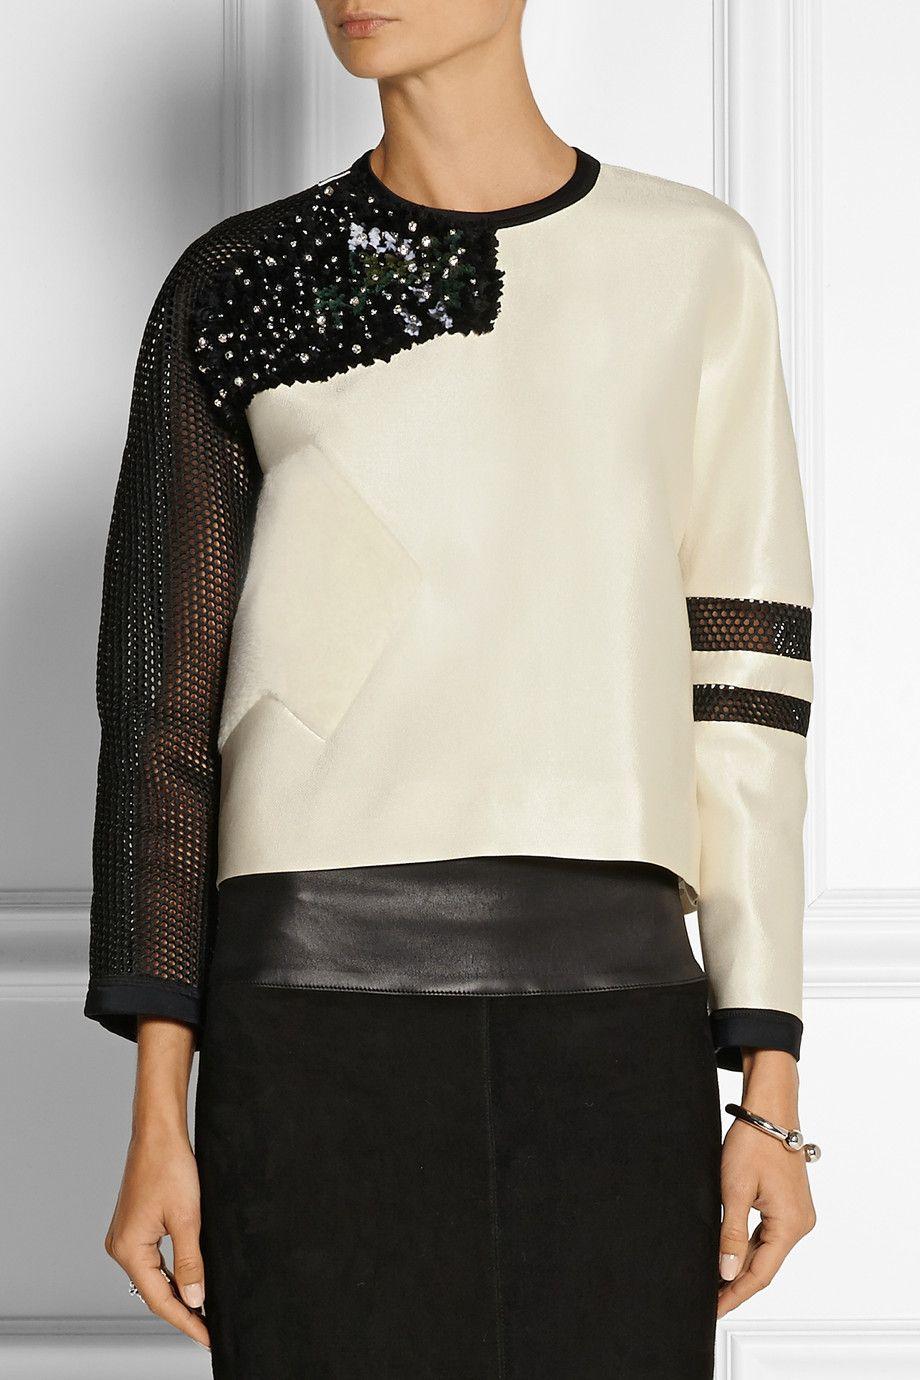 Fendi Embellished tech-satin and mesh top NET-A-PORTER.COM